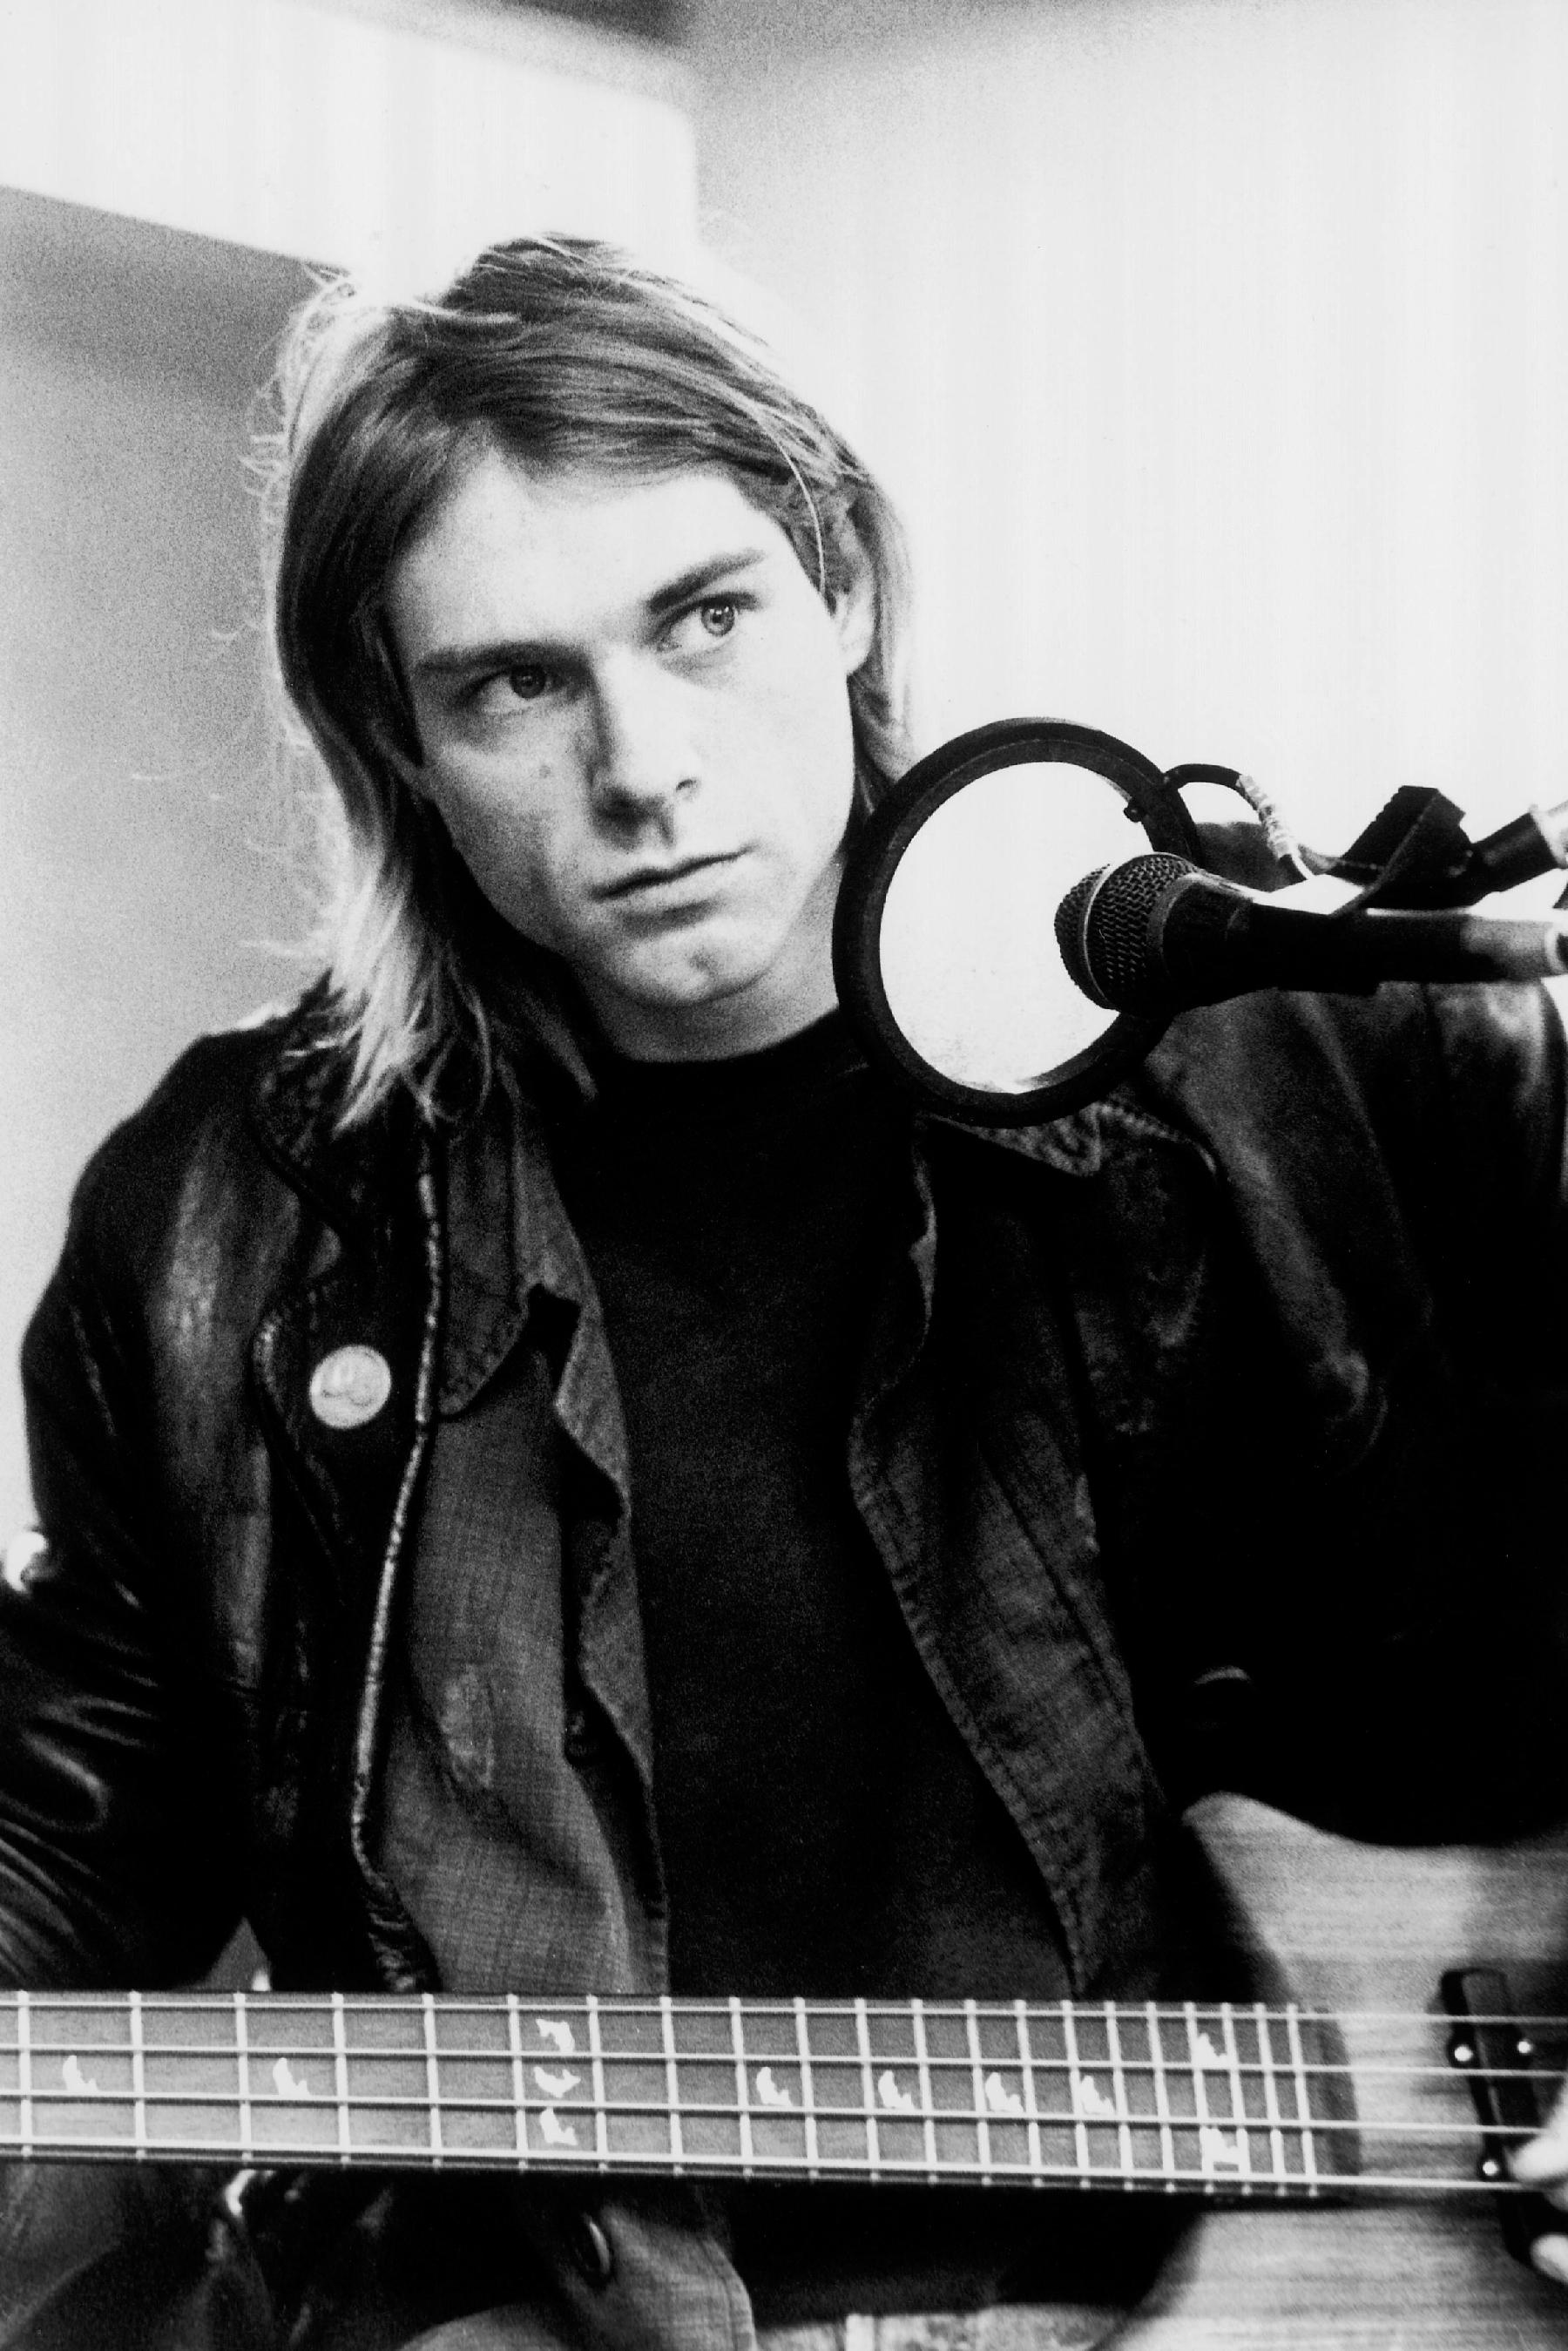 Neil Young, Billie Joe Armstrong, Beck and More Remember Kurt Cobain